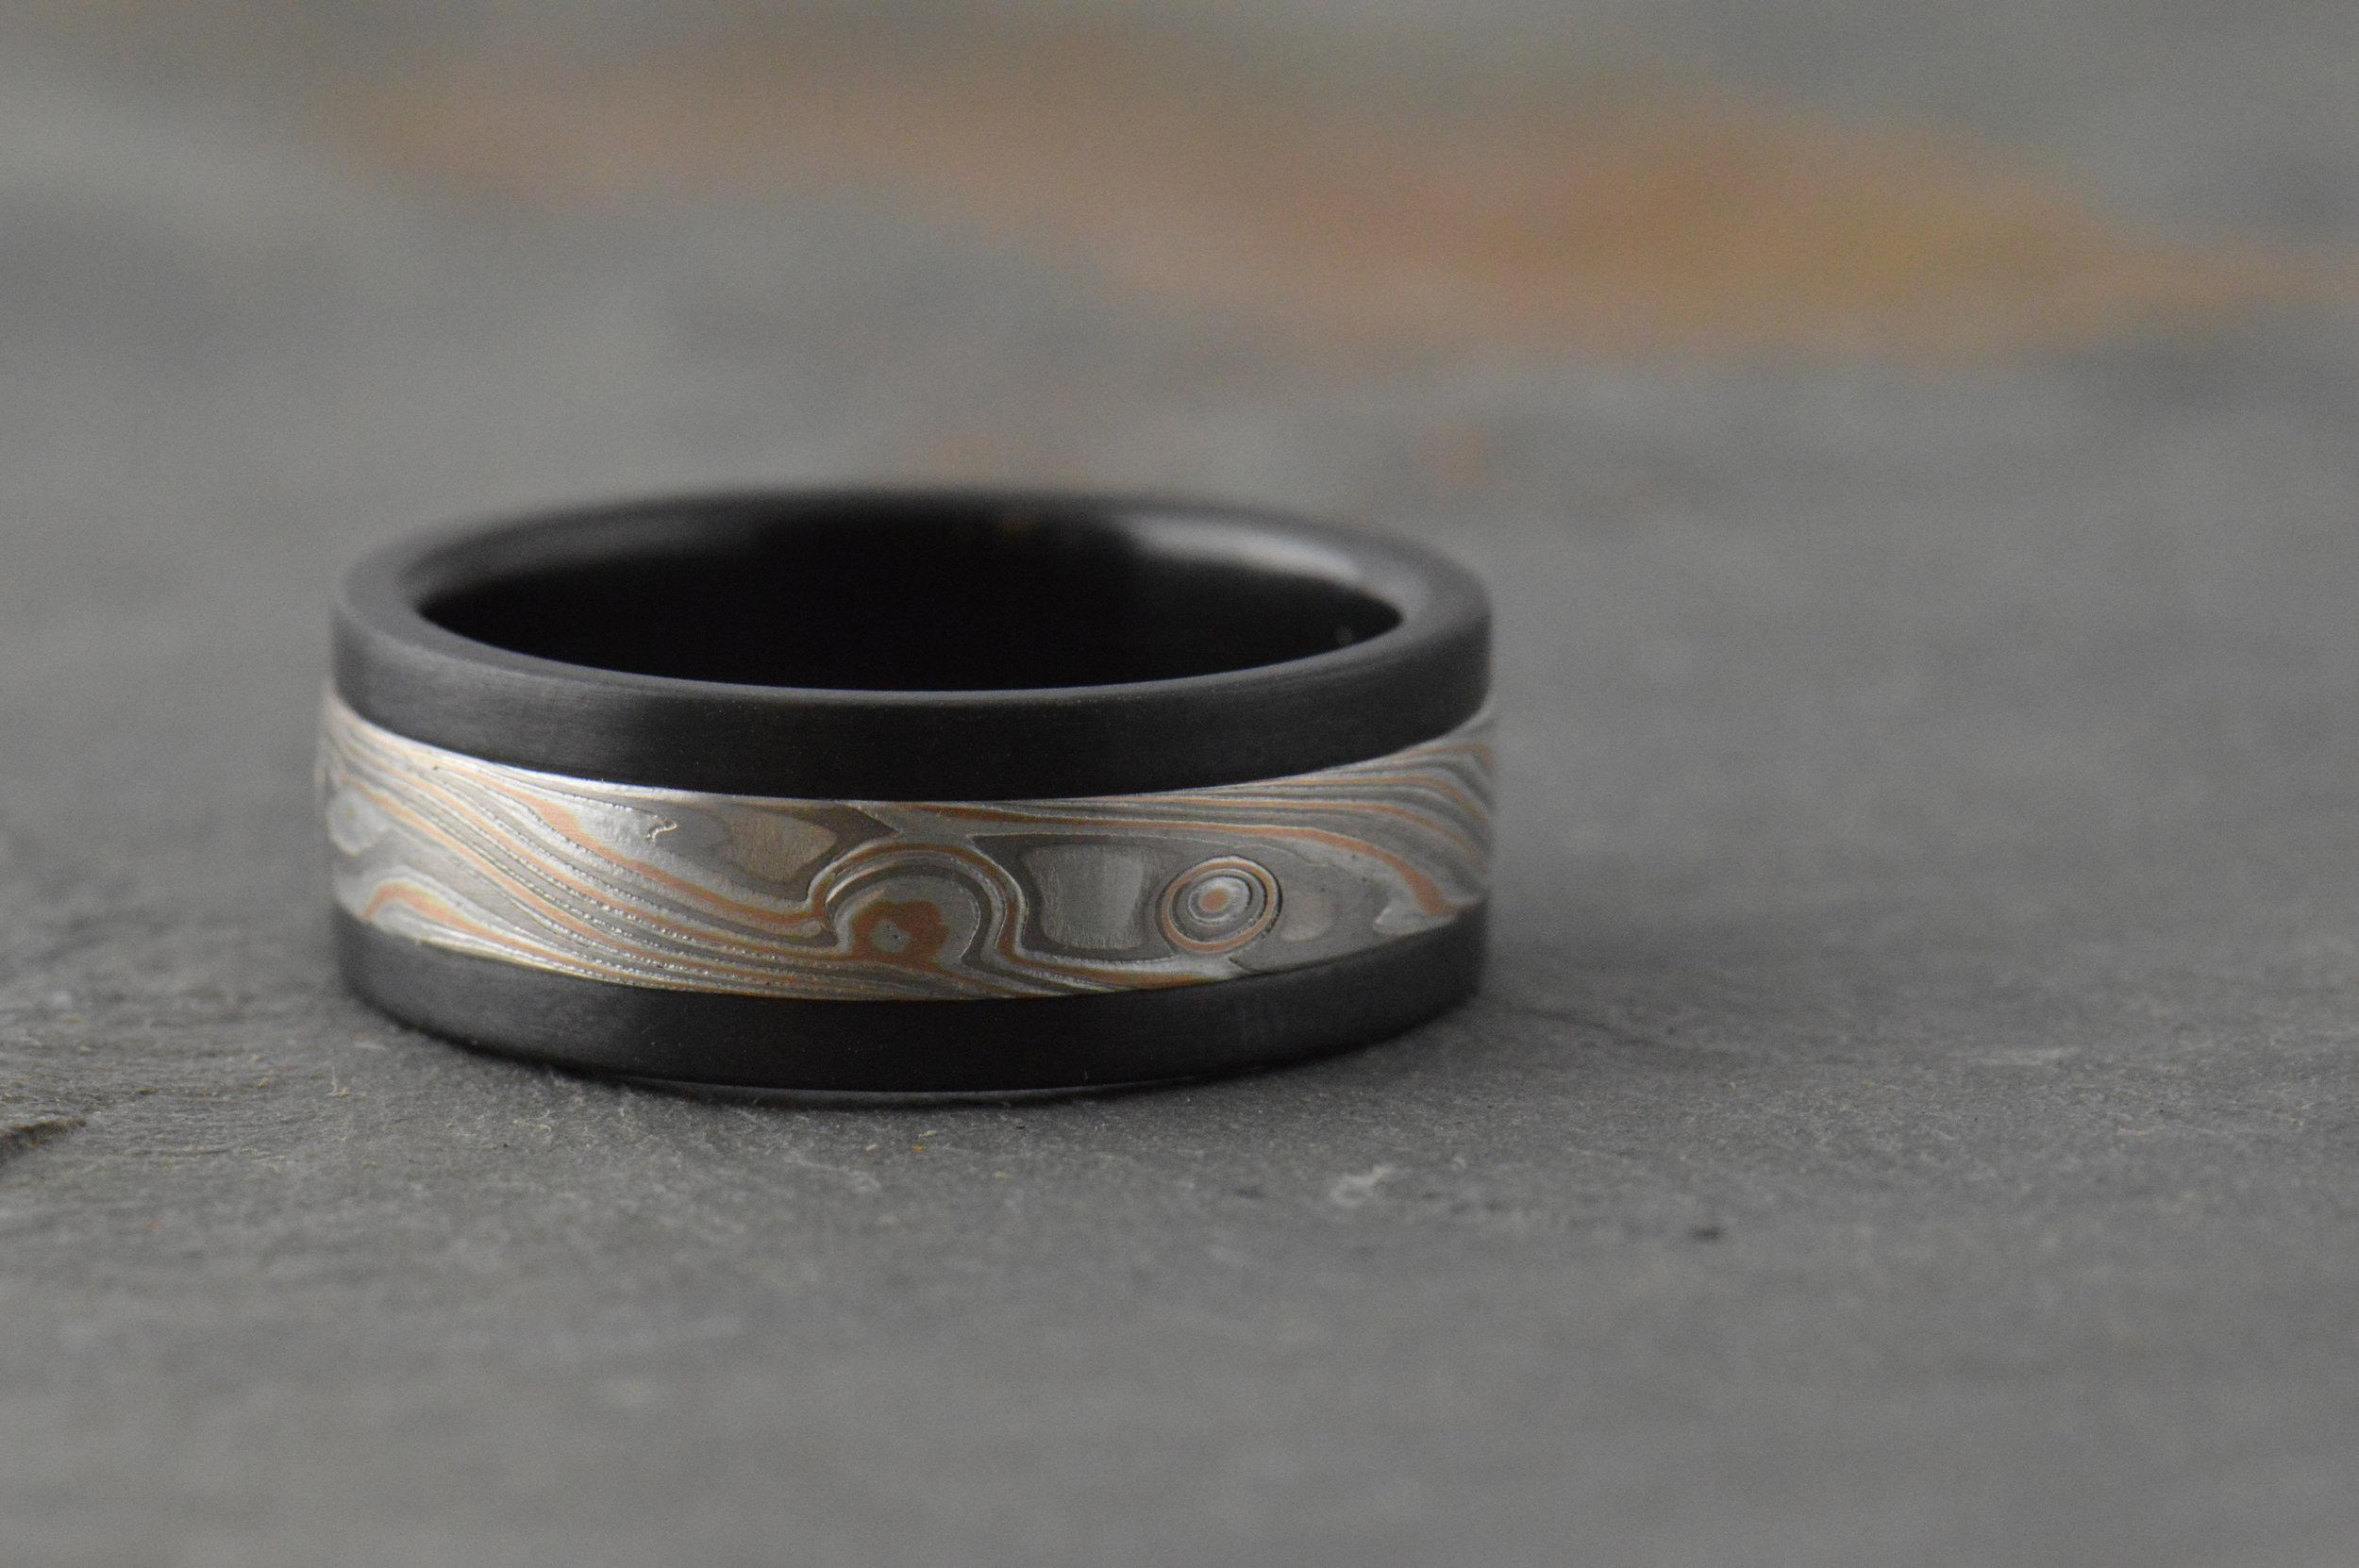 darvier-zirconium-mokume-burl-pattern-ring.JPG